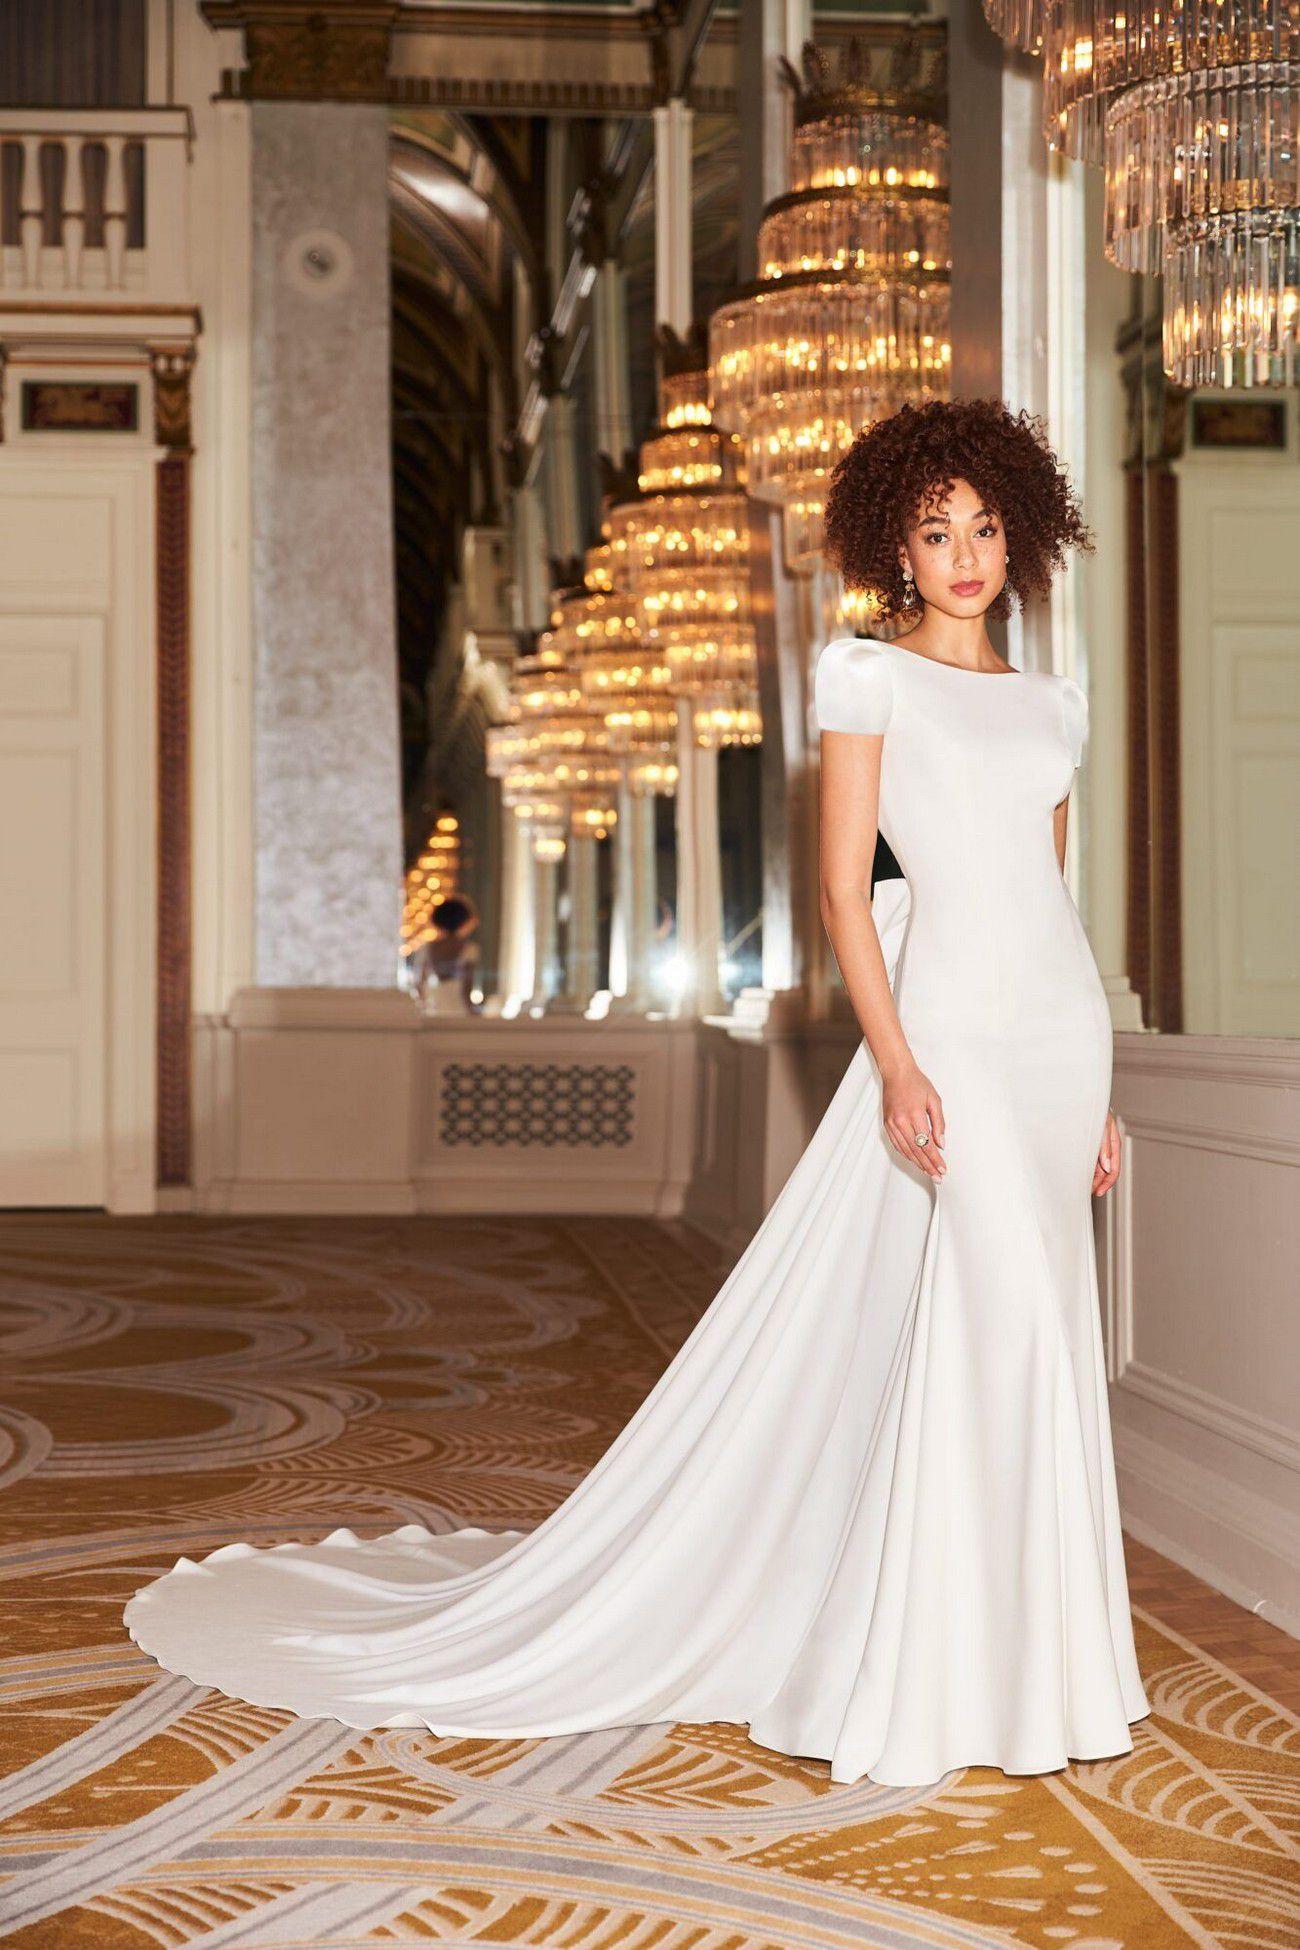 https://www.bridalreflections.com/wp-content/uploads/2021/08/2350f-min-1333x2000.jpg